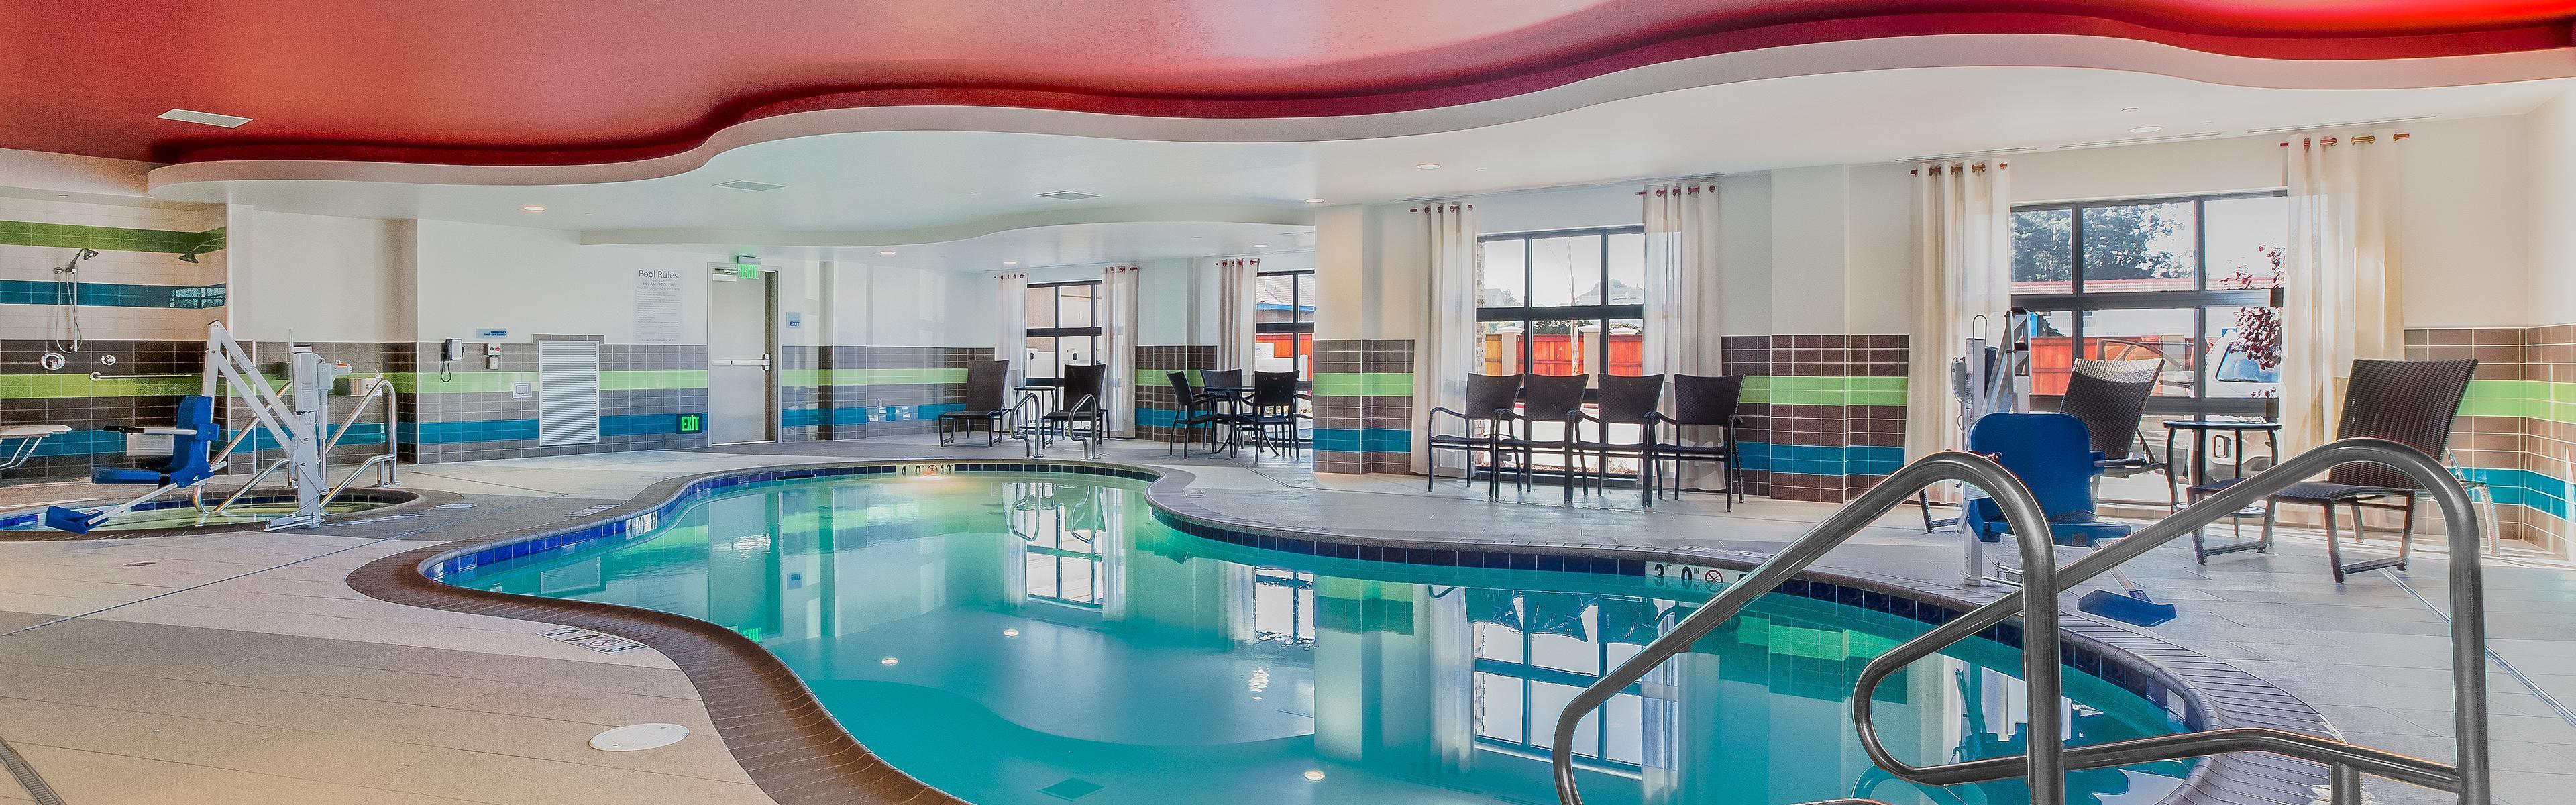 Holiday Inn Express & Suites Eureka image 2